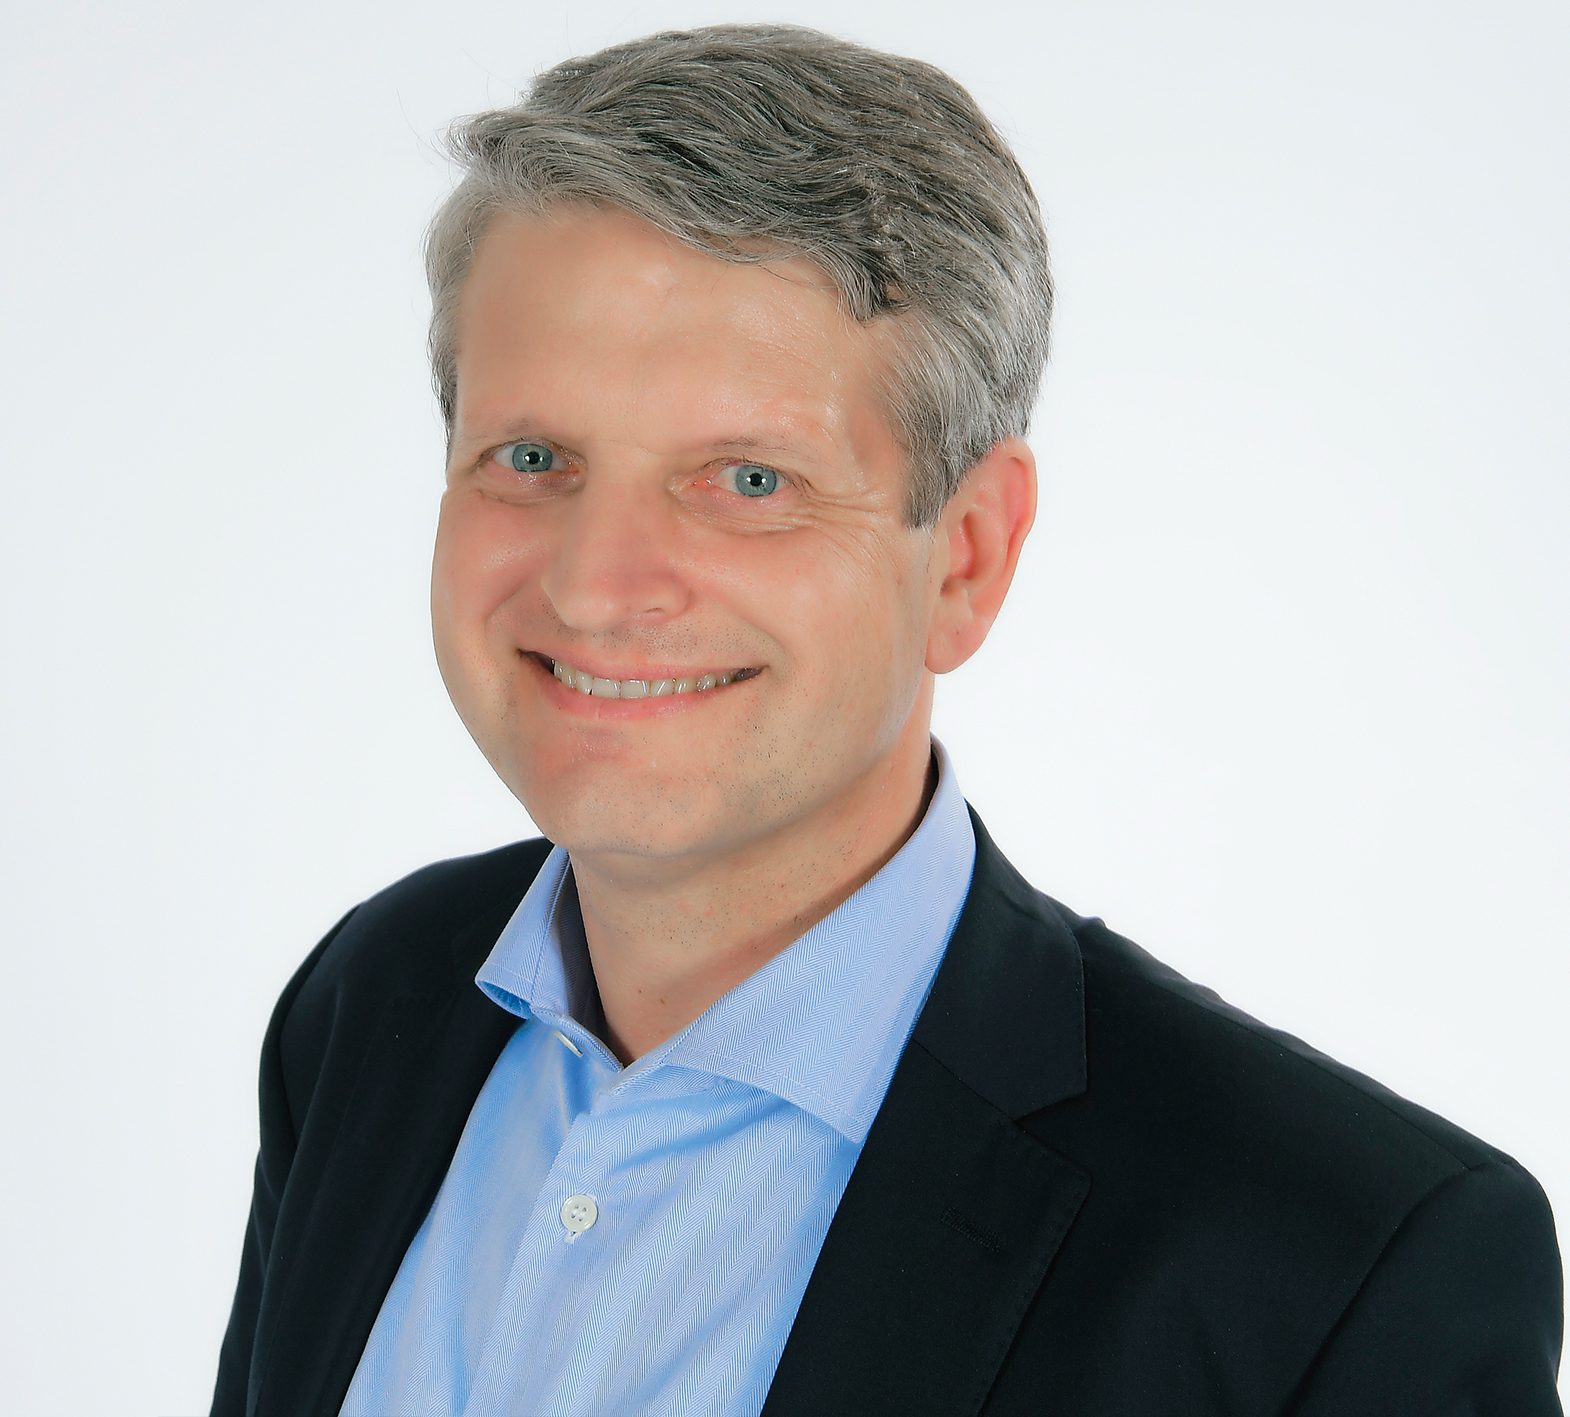 Stadtverordneter CDU-Fraktion Frankfurt Dr. Albrecht Kochsiek